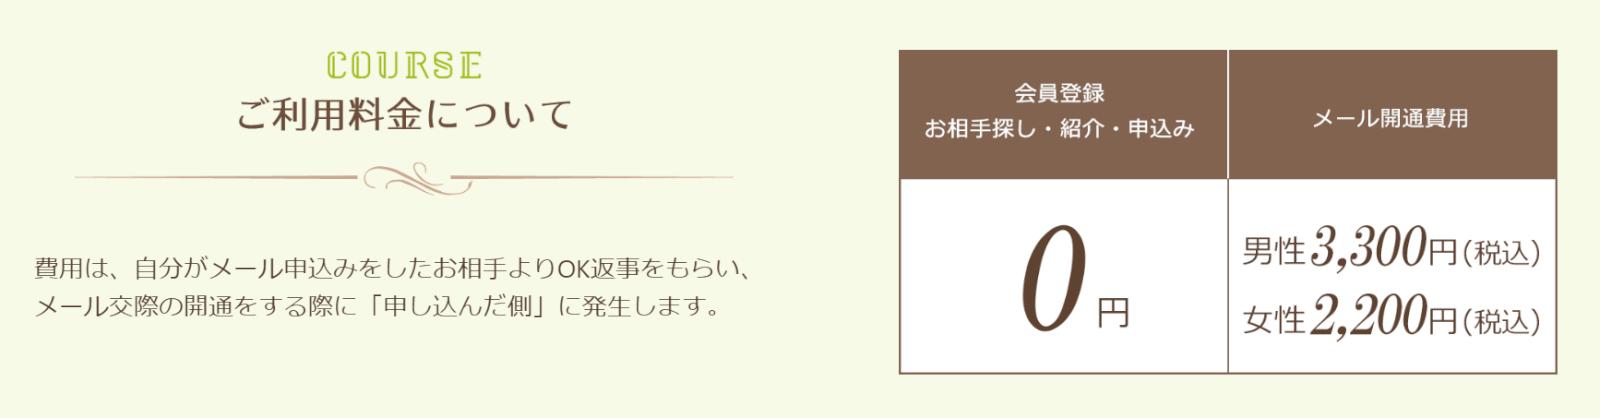 FireShot Capture 115 - e-お見合い結婚情報センターが、あなたの運命の出会いをサポート! - e-omiai.jp